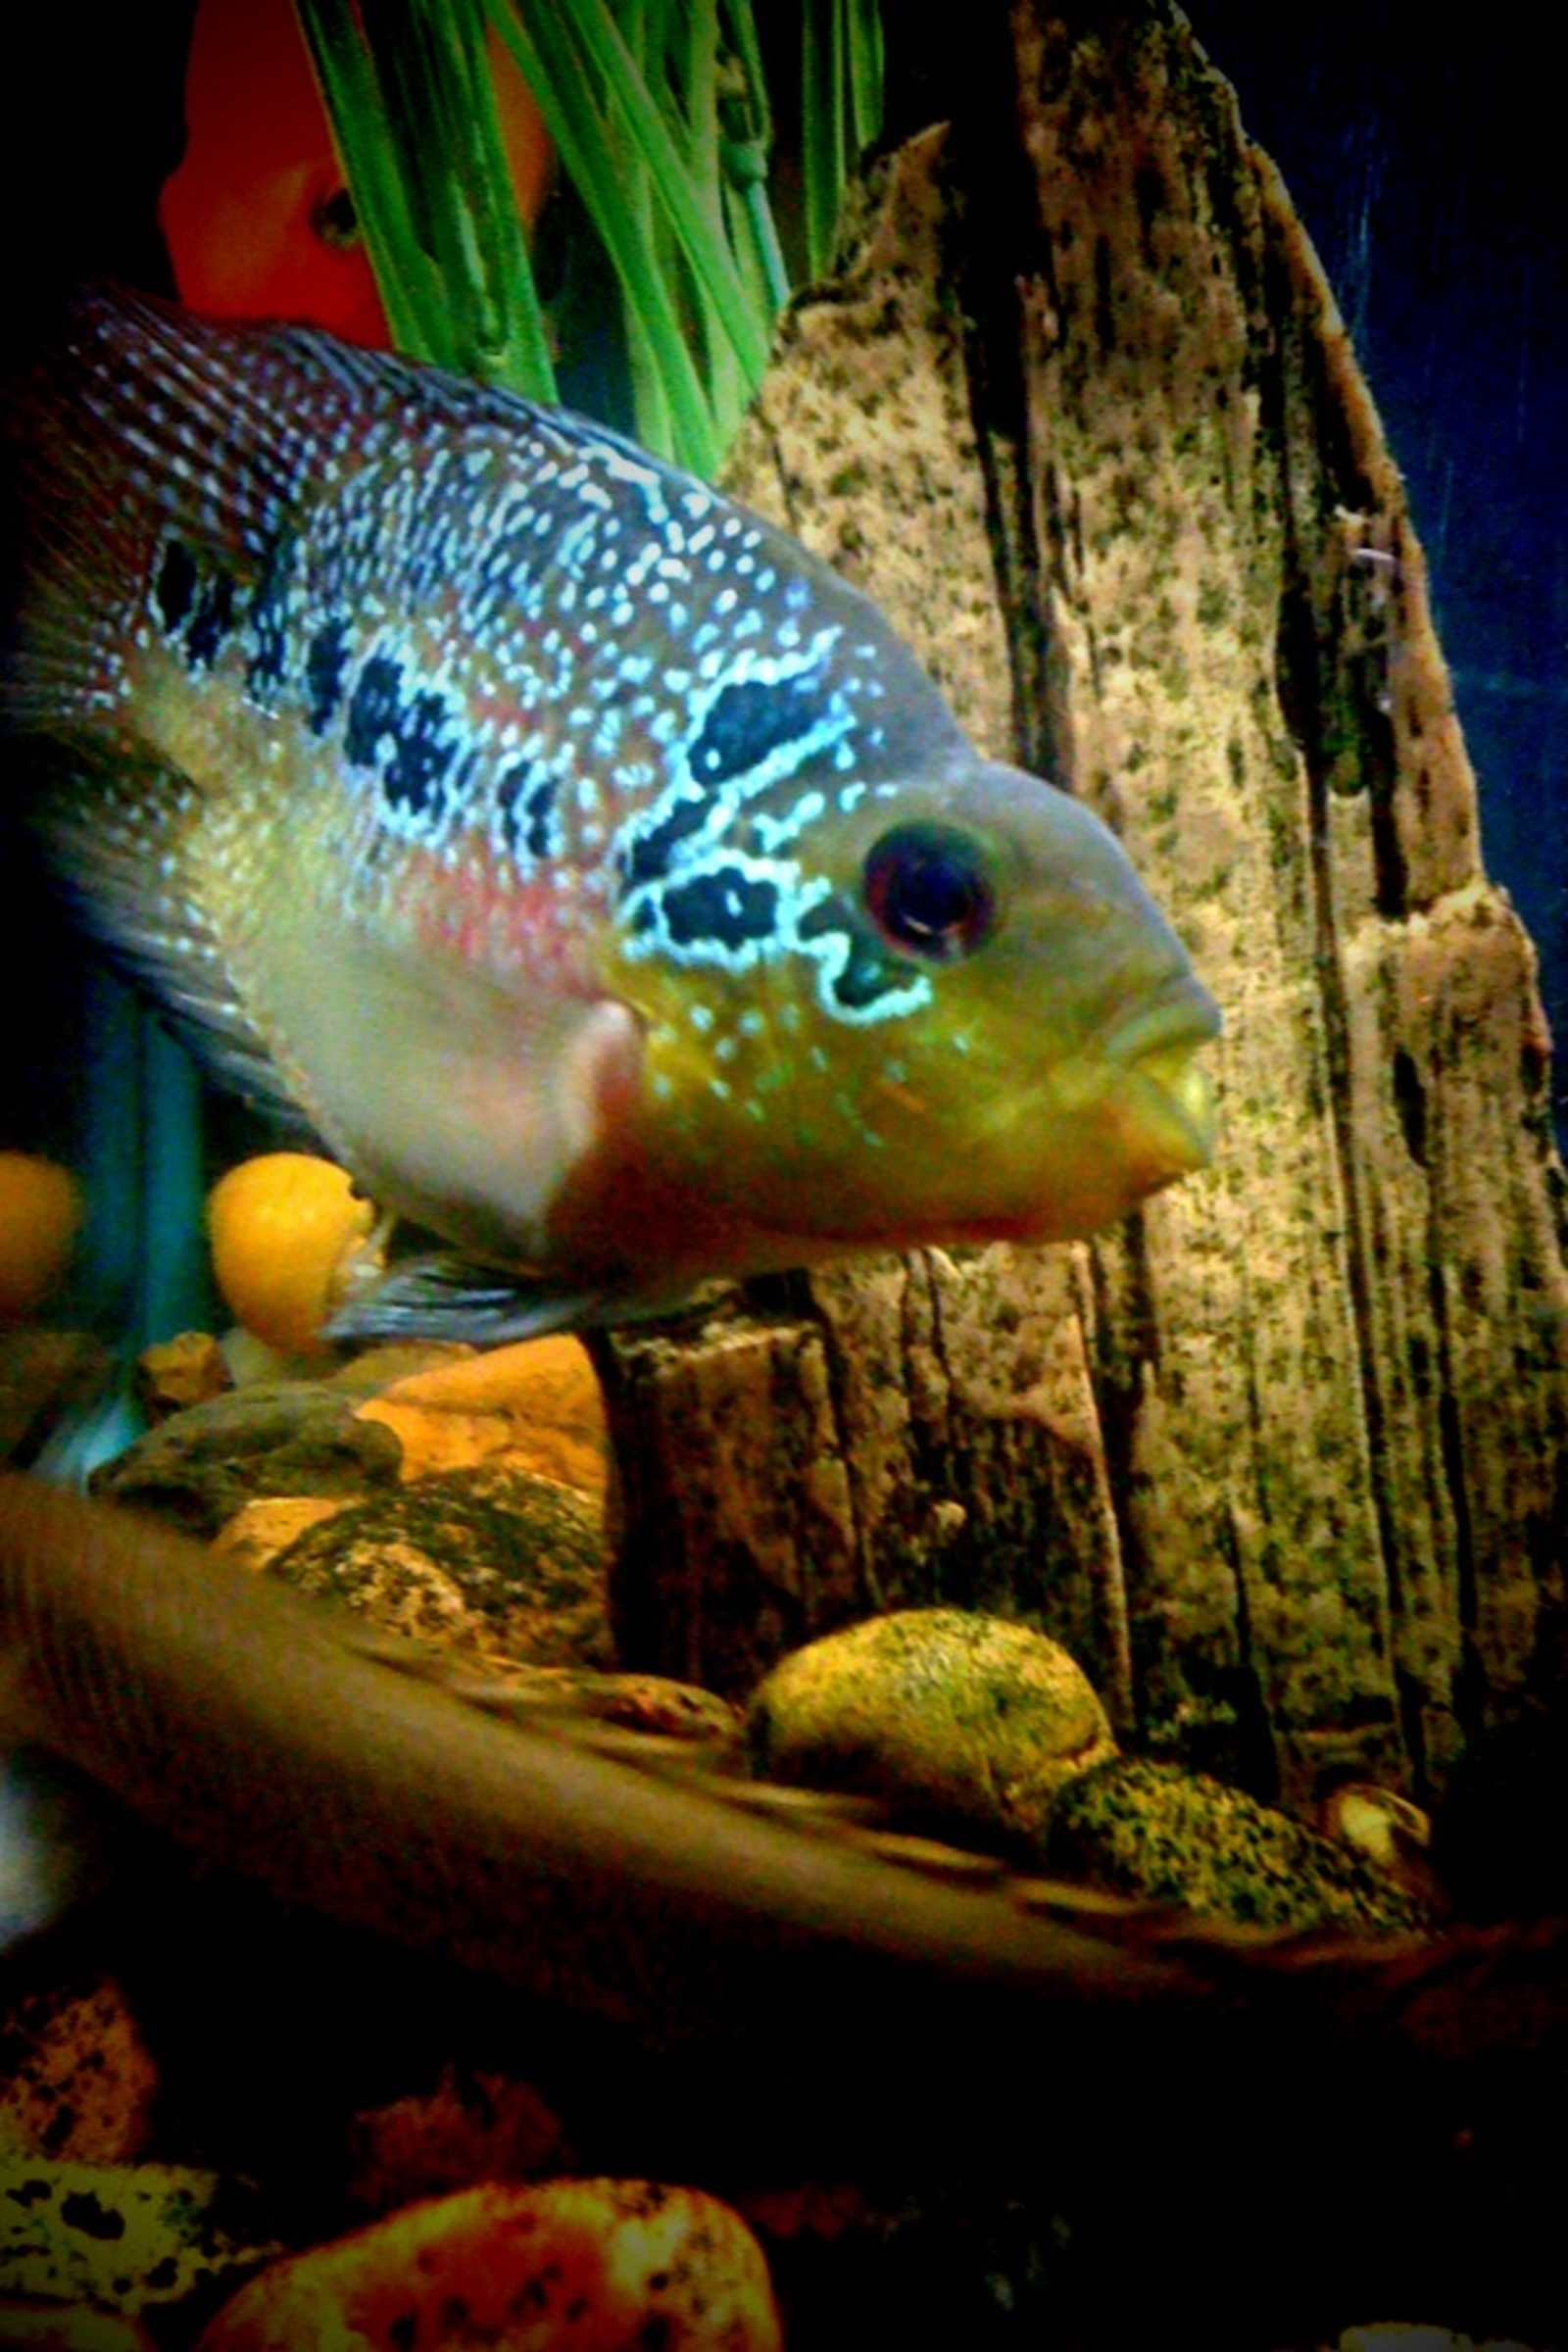 Kirin Bonsai Flowerhorn Parrot Hybrid By Maged Sabry Cichlids Com